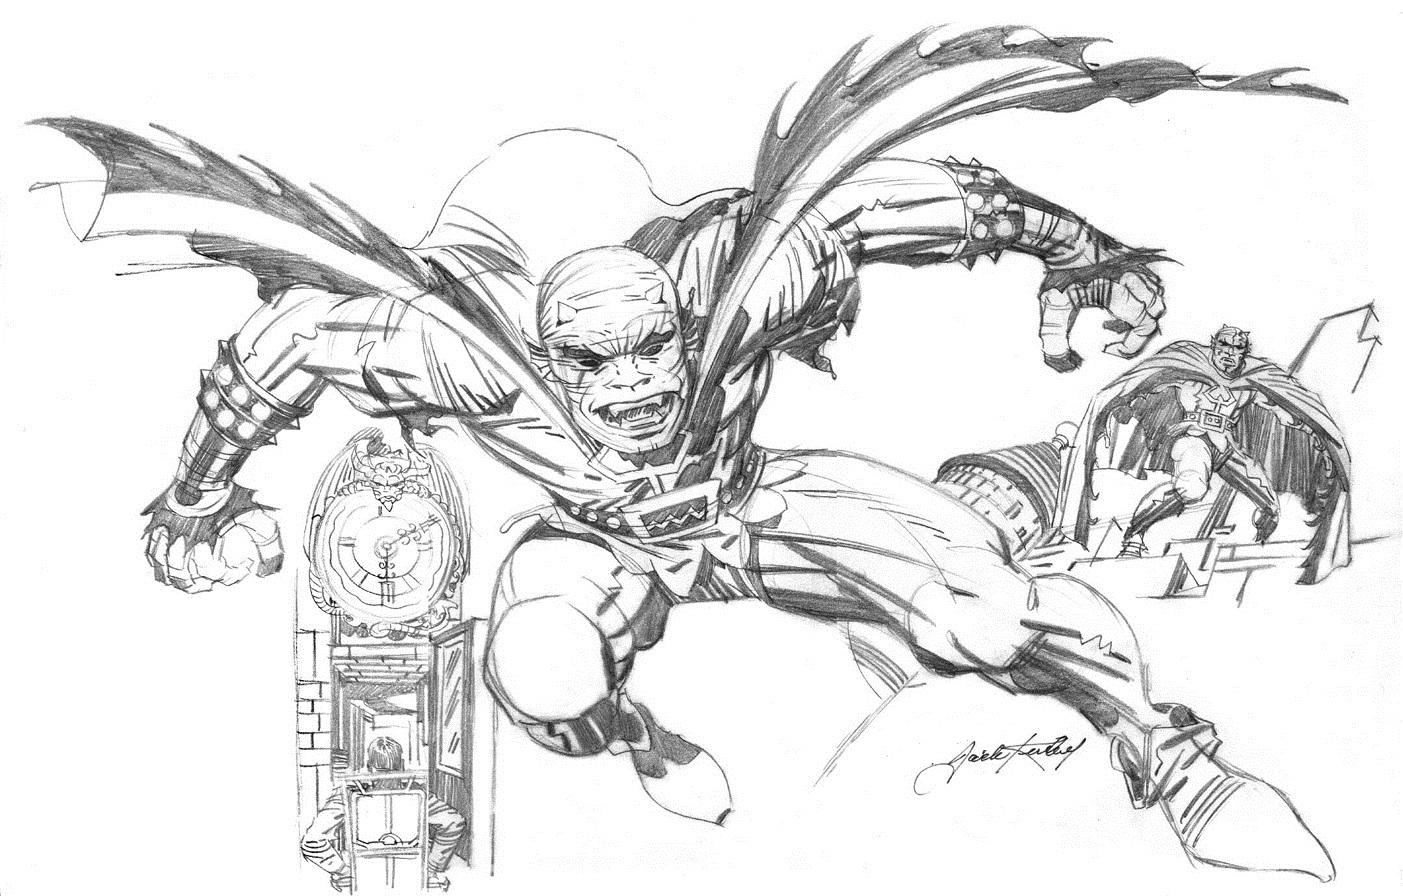 Cap'n's Comics: The Beginnings Of The Demon by Jack Kirby